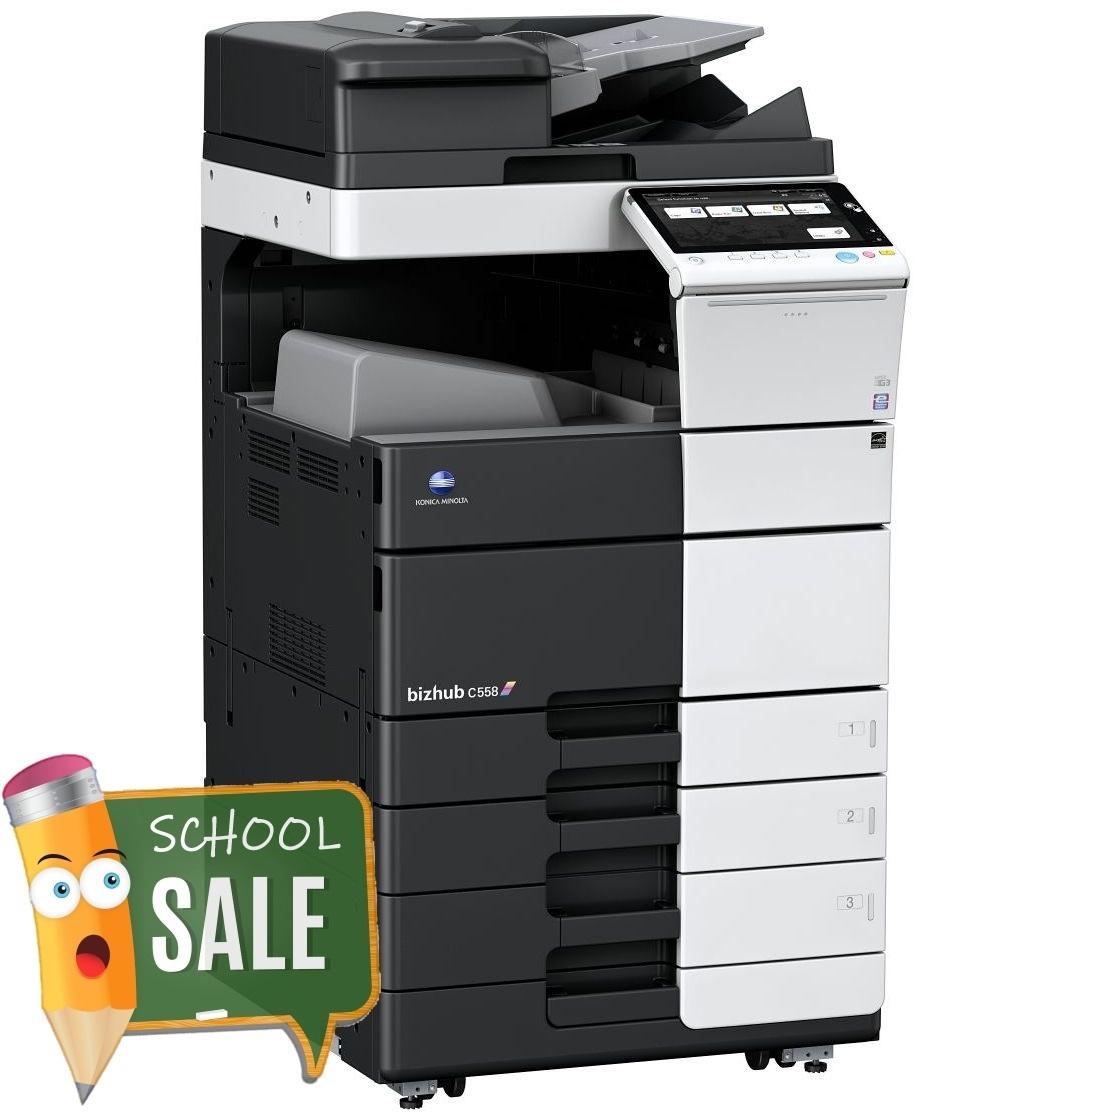 Konica Minolta Bizhub C558 OT 506 PC 115 Colour Copier Printer Rental Price Offers